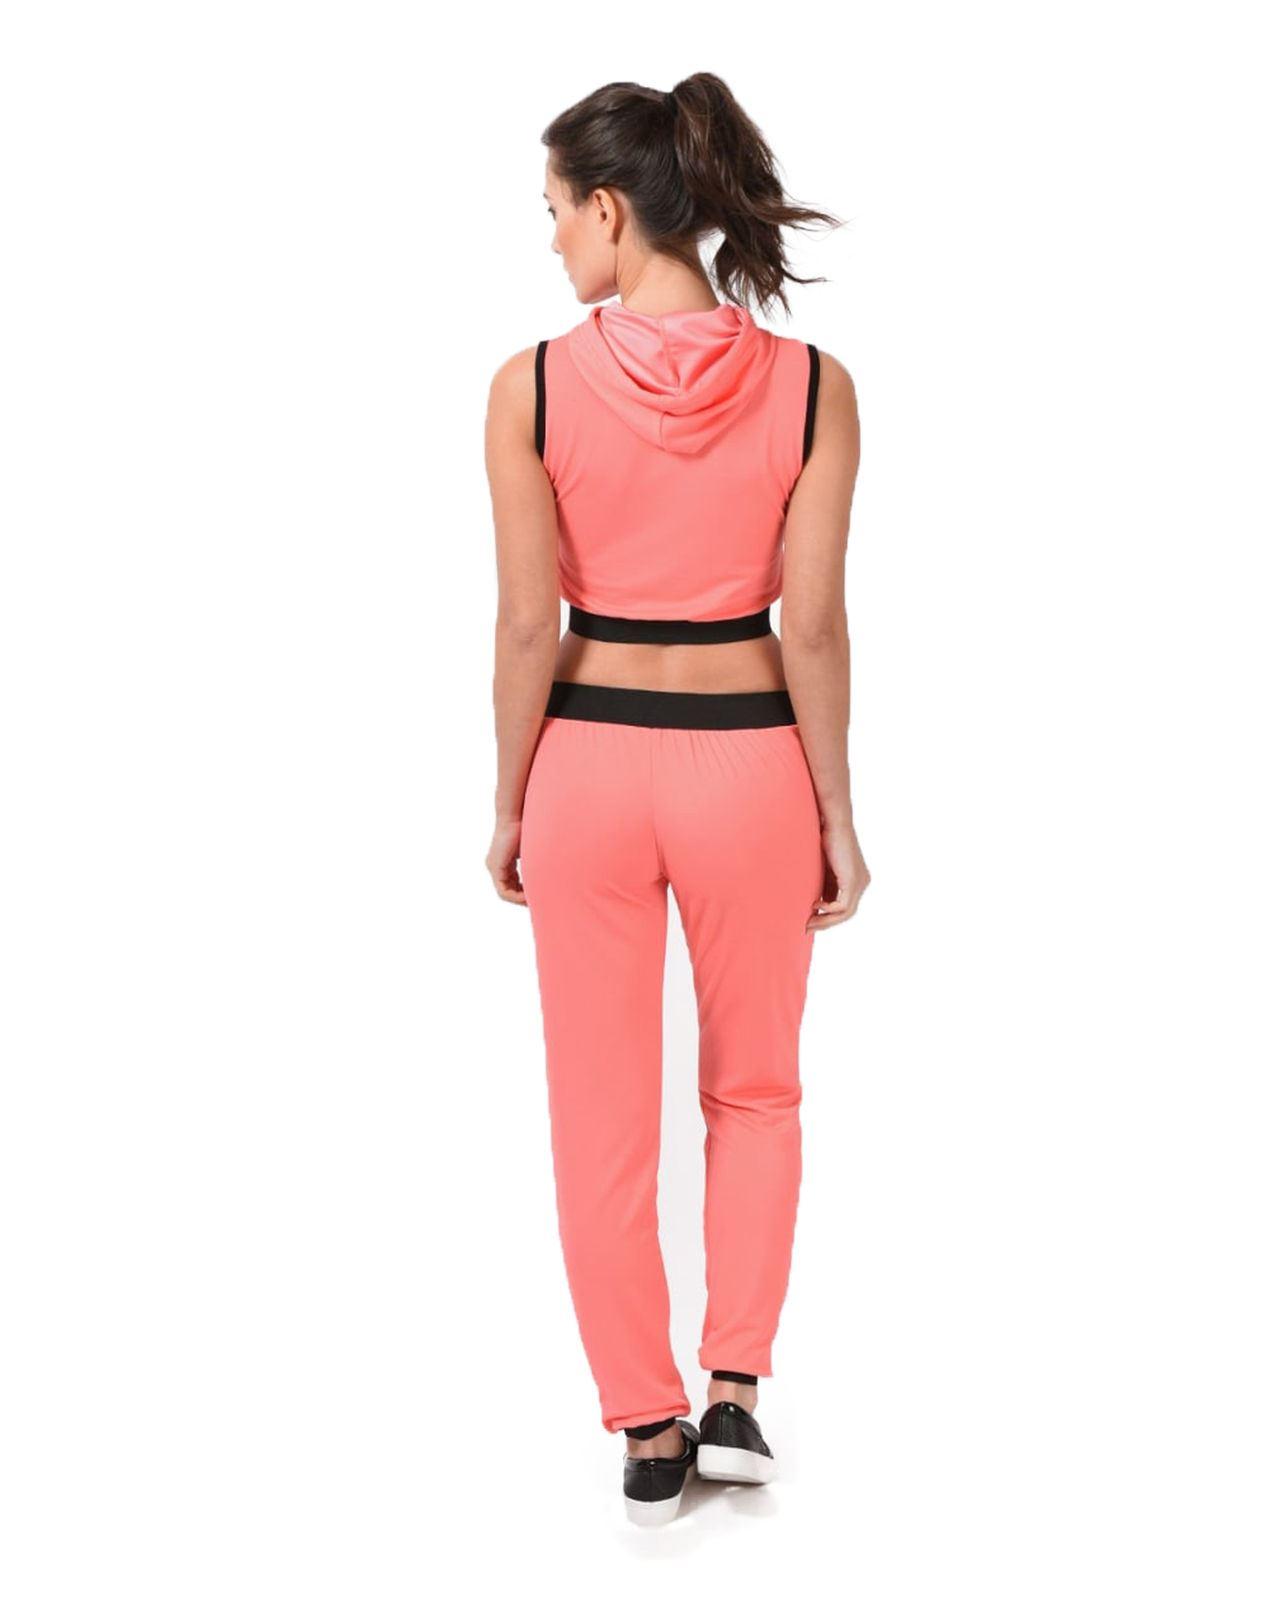 Ladies Women LOVE FITNESS Gym Yoga Hooded 2pcs Tracksuit Jogging Set Top Bottom